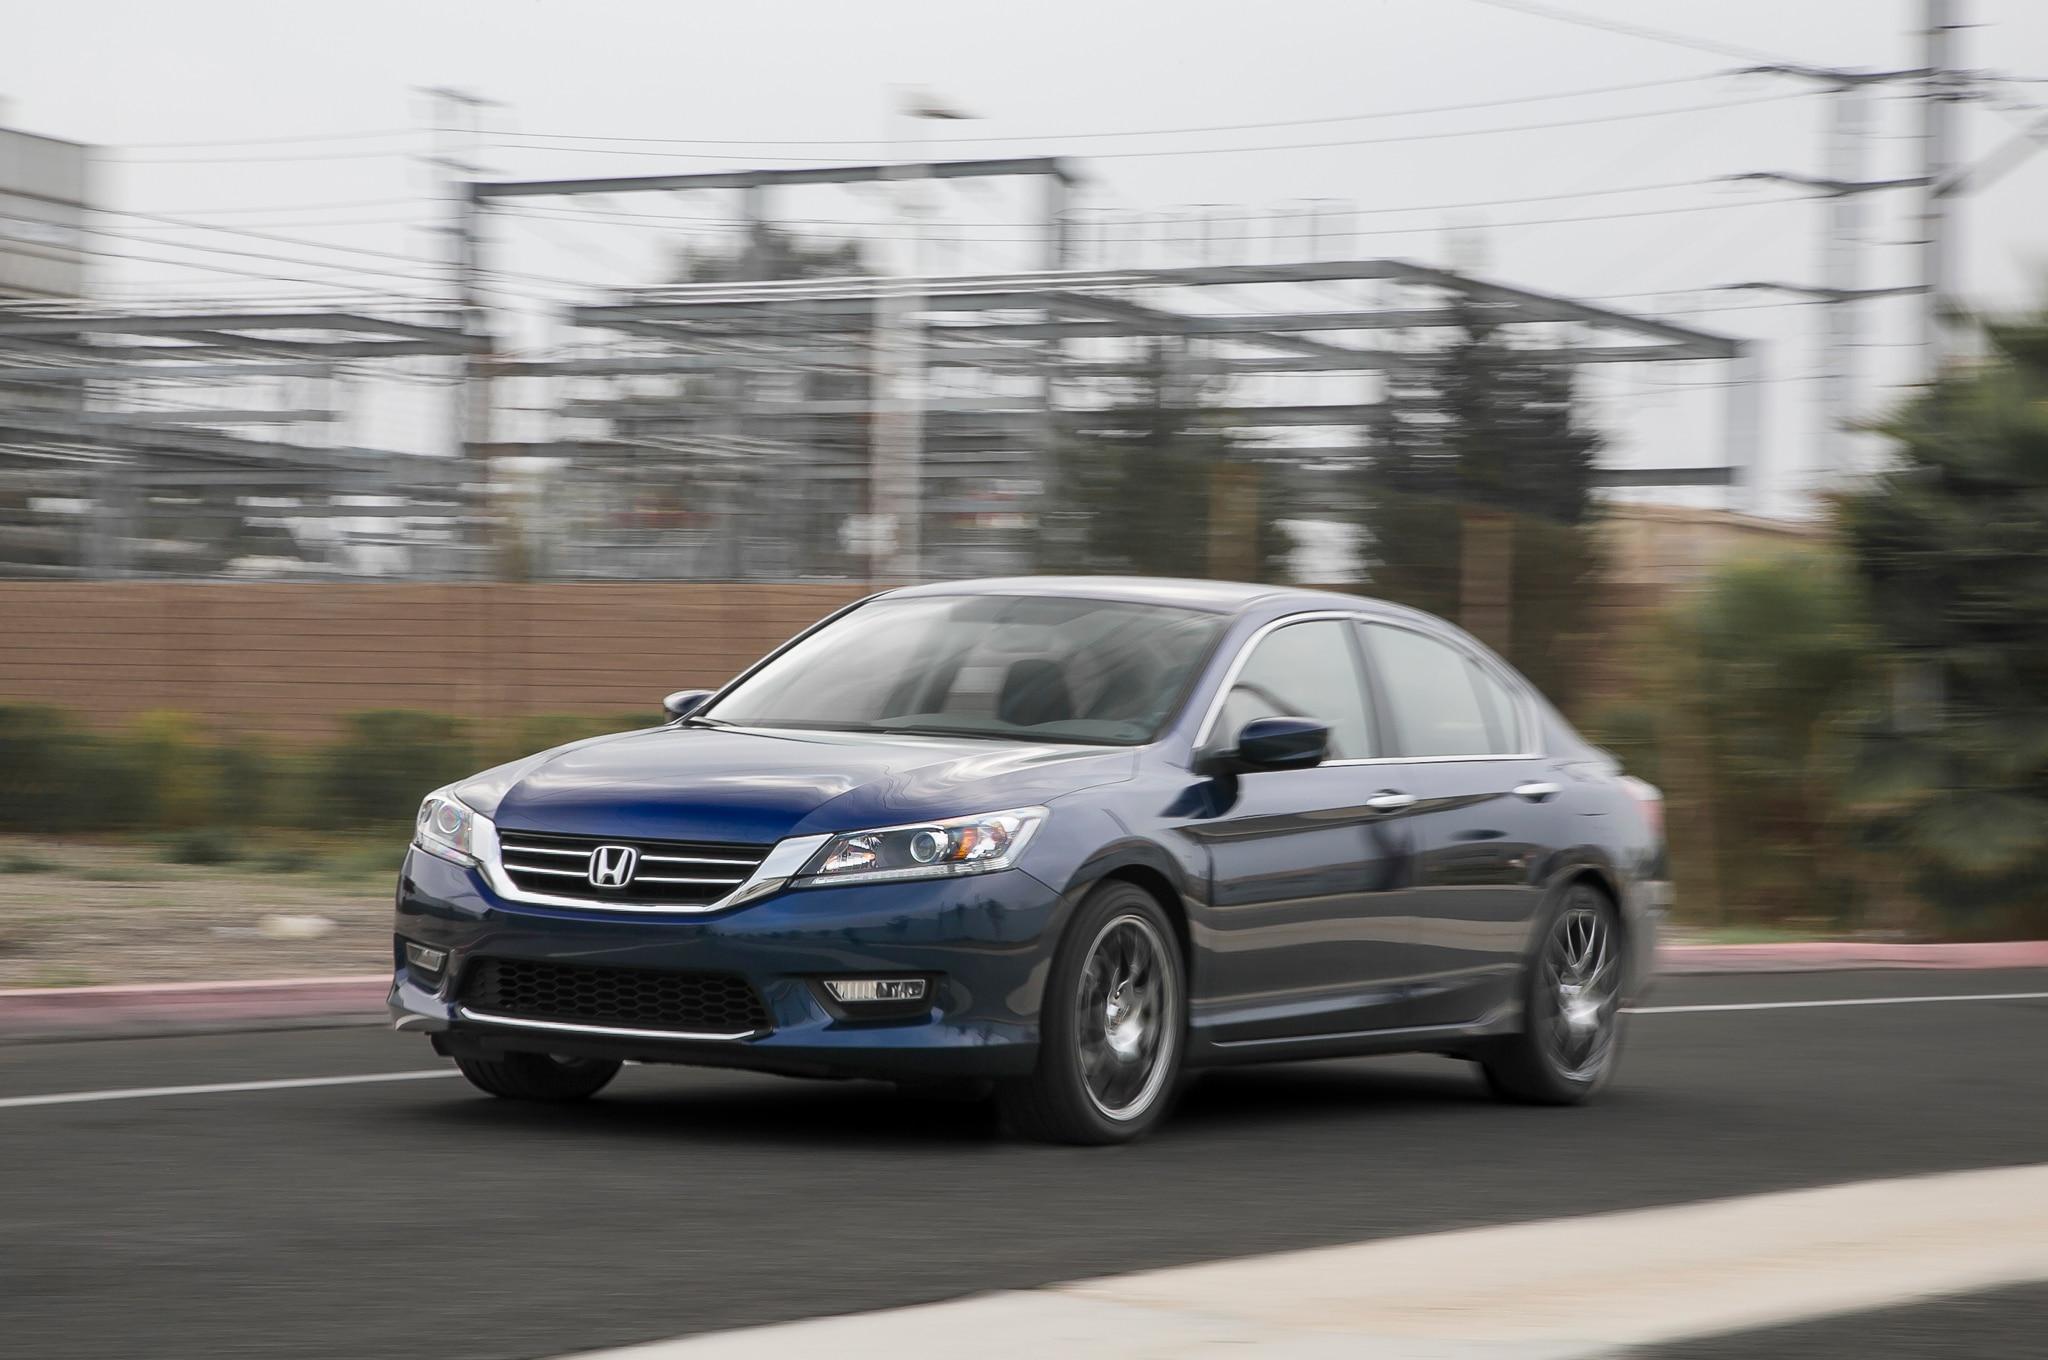 trend three sedan motor news quarters accord en front sport arrival honda